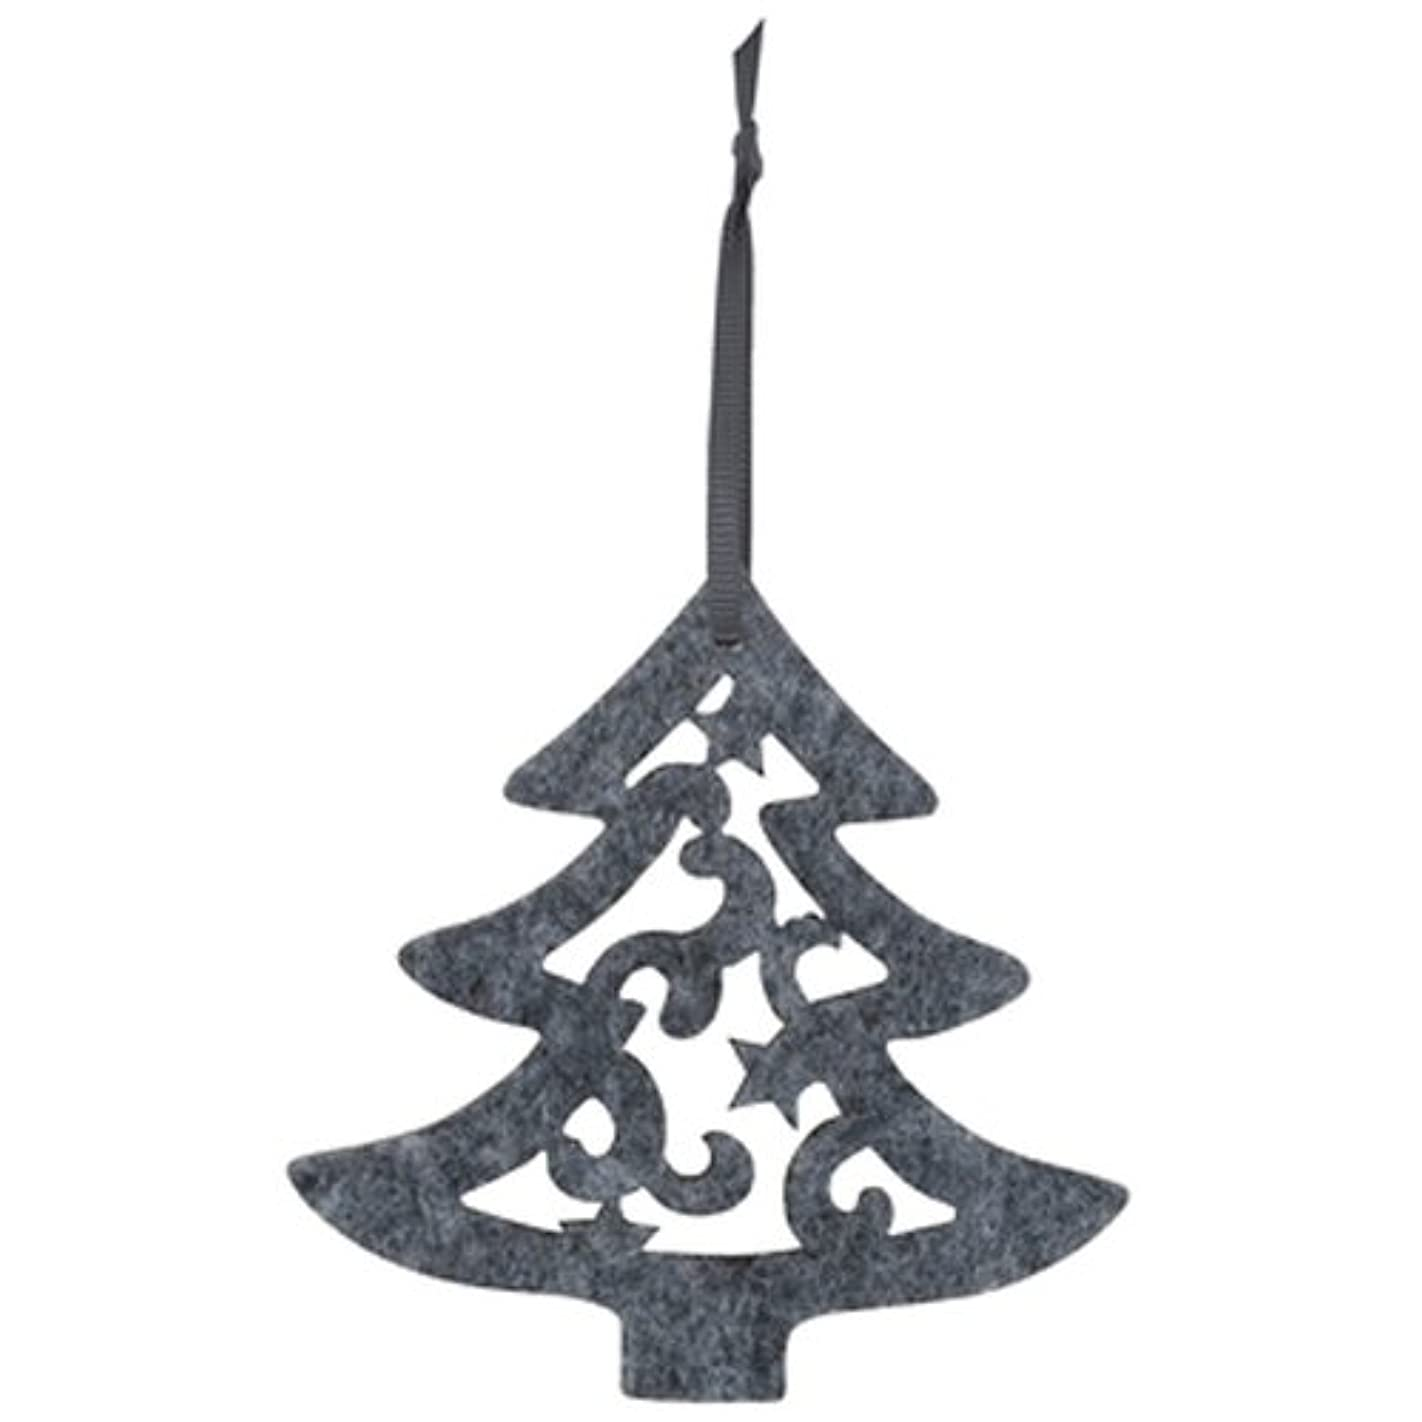 The Gift Wrap Company Felt Die-Cut Holiday Tag, Tree, Gray c30523571756